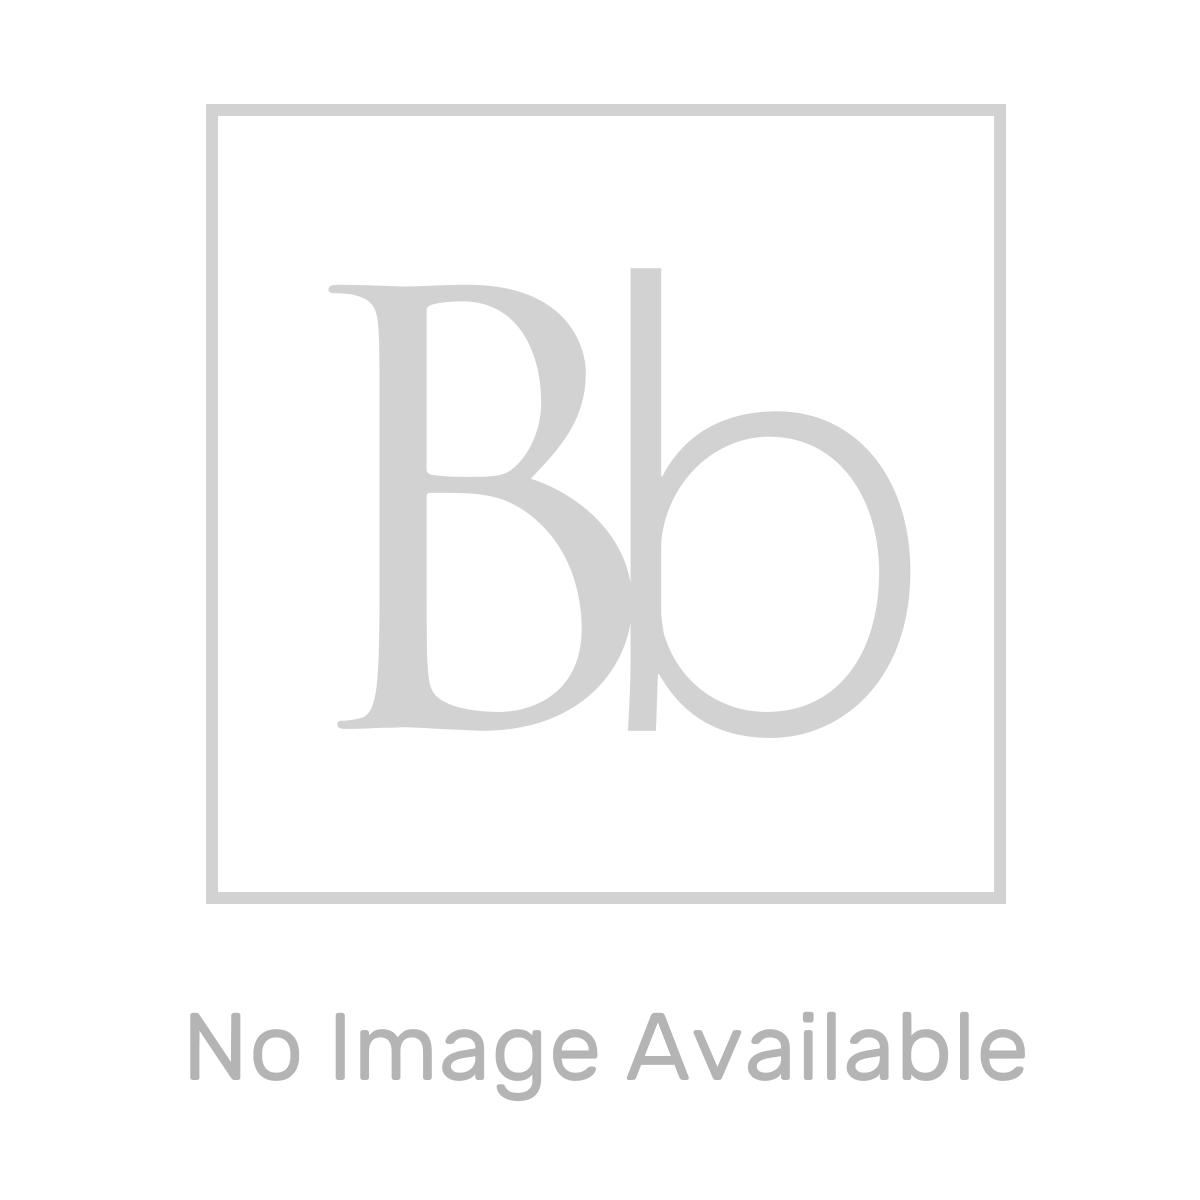 Bathrooms To Love RefleXion Flex Pivot Shower Door with Optional Side Panel